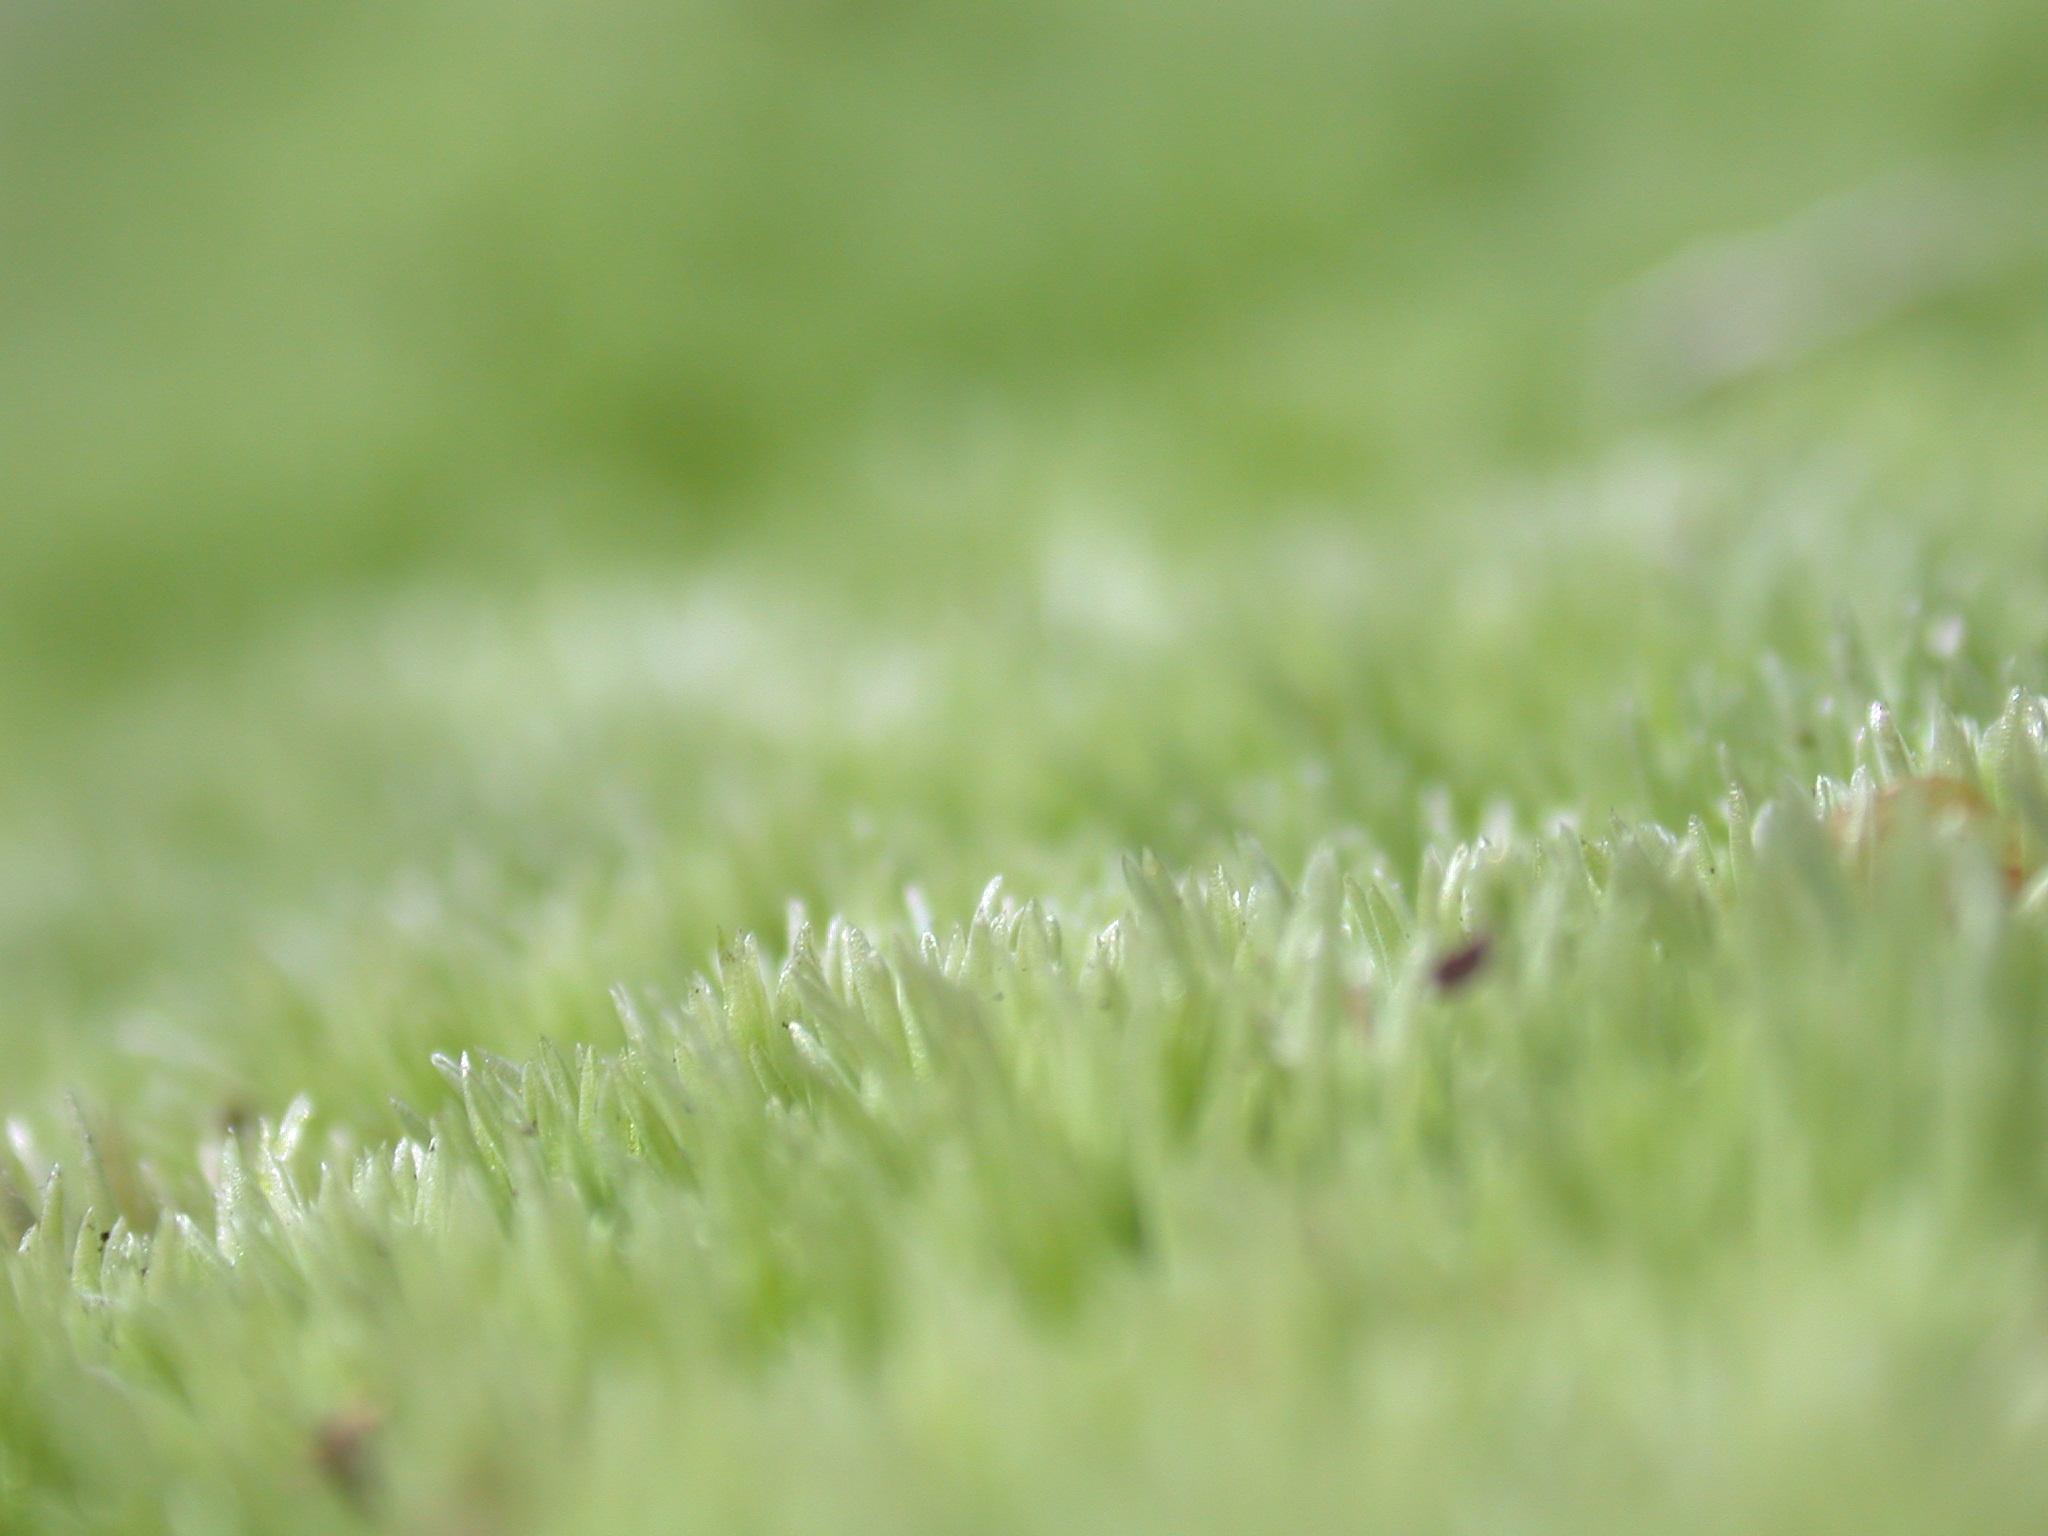 janneke extreme closeup depth of field moss